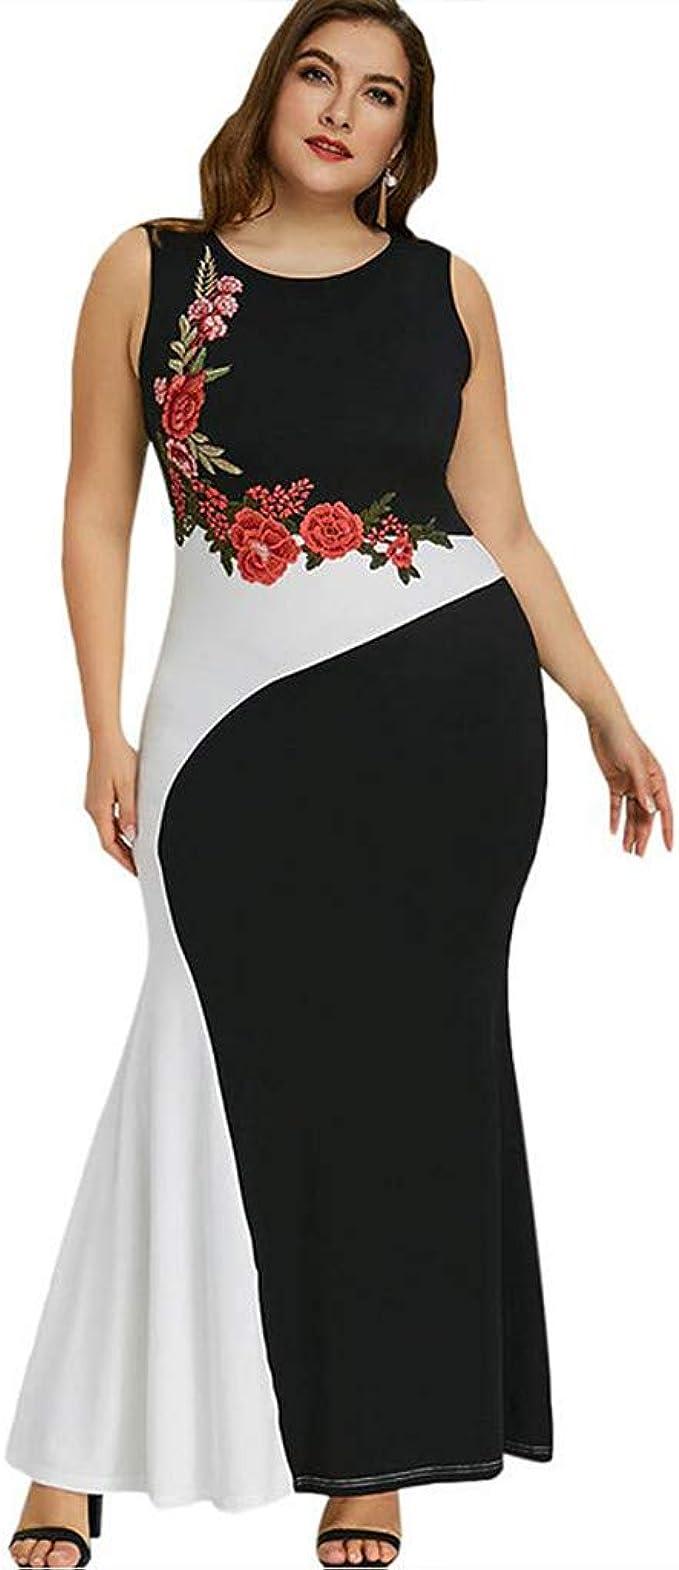 LOPILY Abendkleider Große Größen Eleganter Cocktail Rockabilly